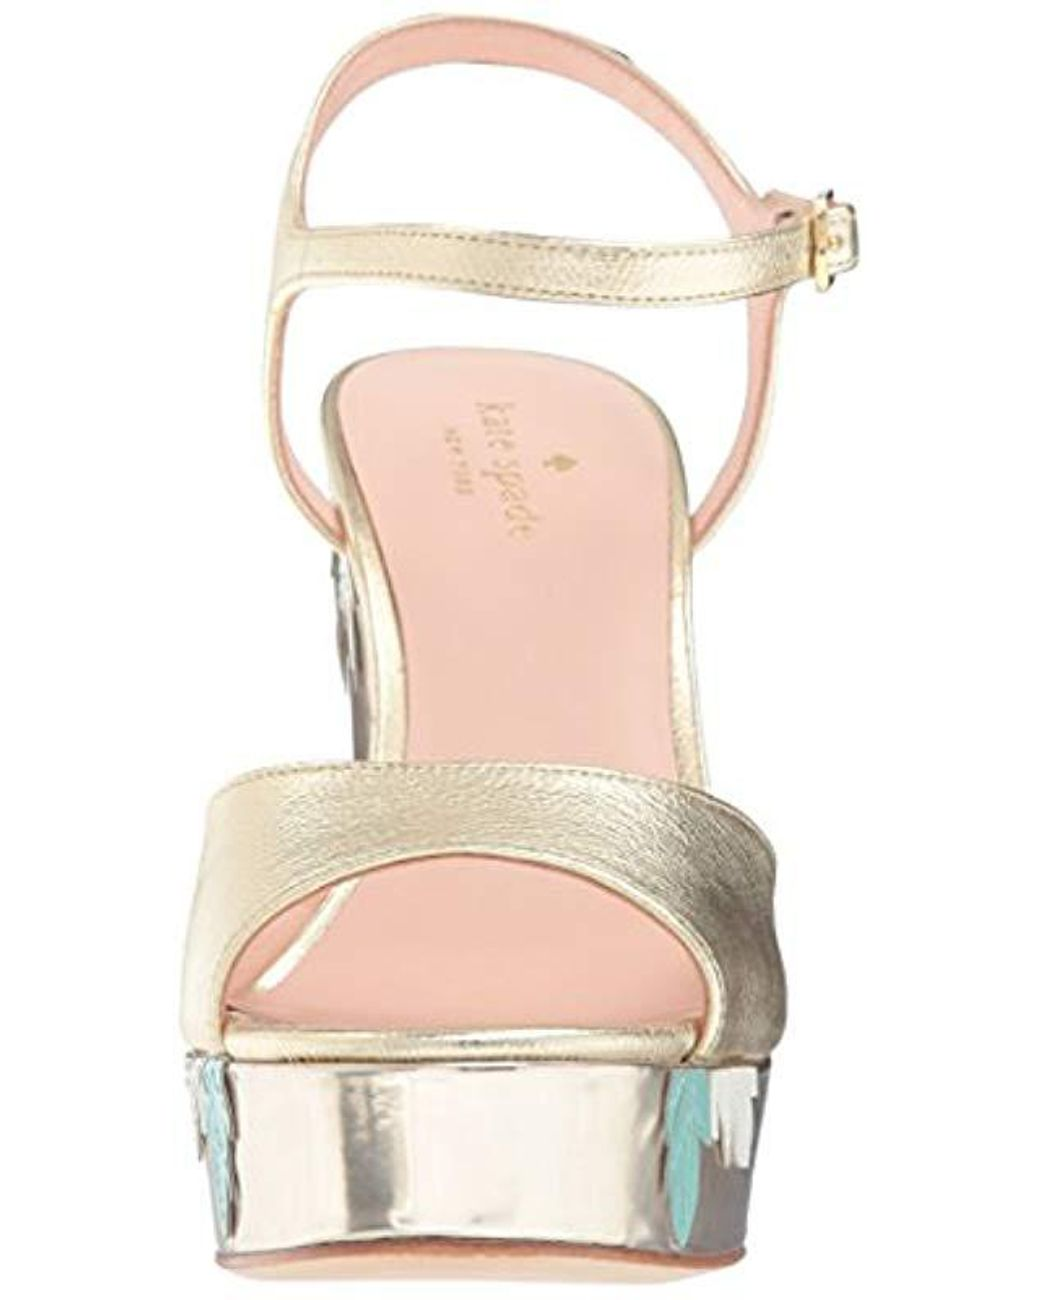 6f8da255de12 Lyst - Kate Spade Darie Wedge Sandal in Metallic - Save 50%